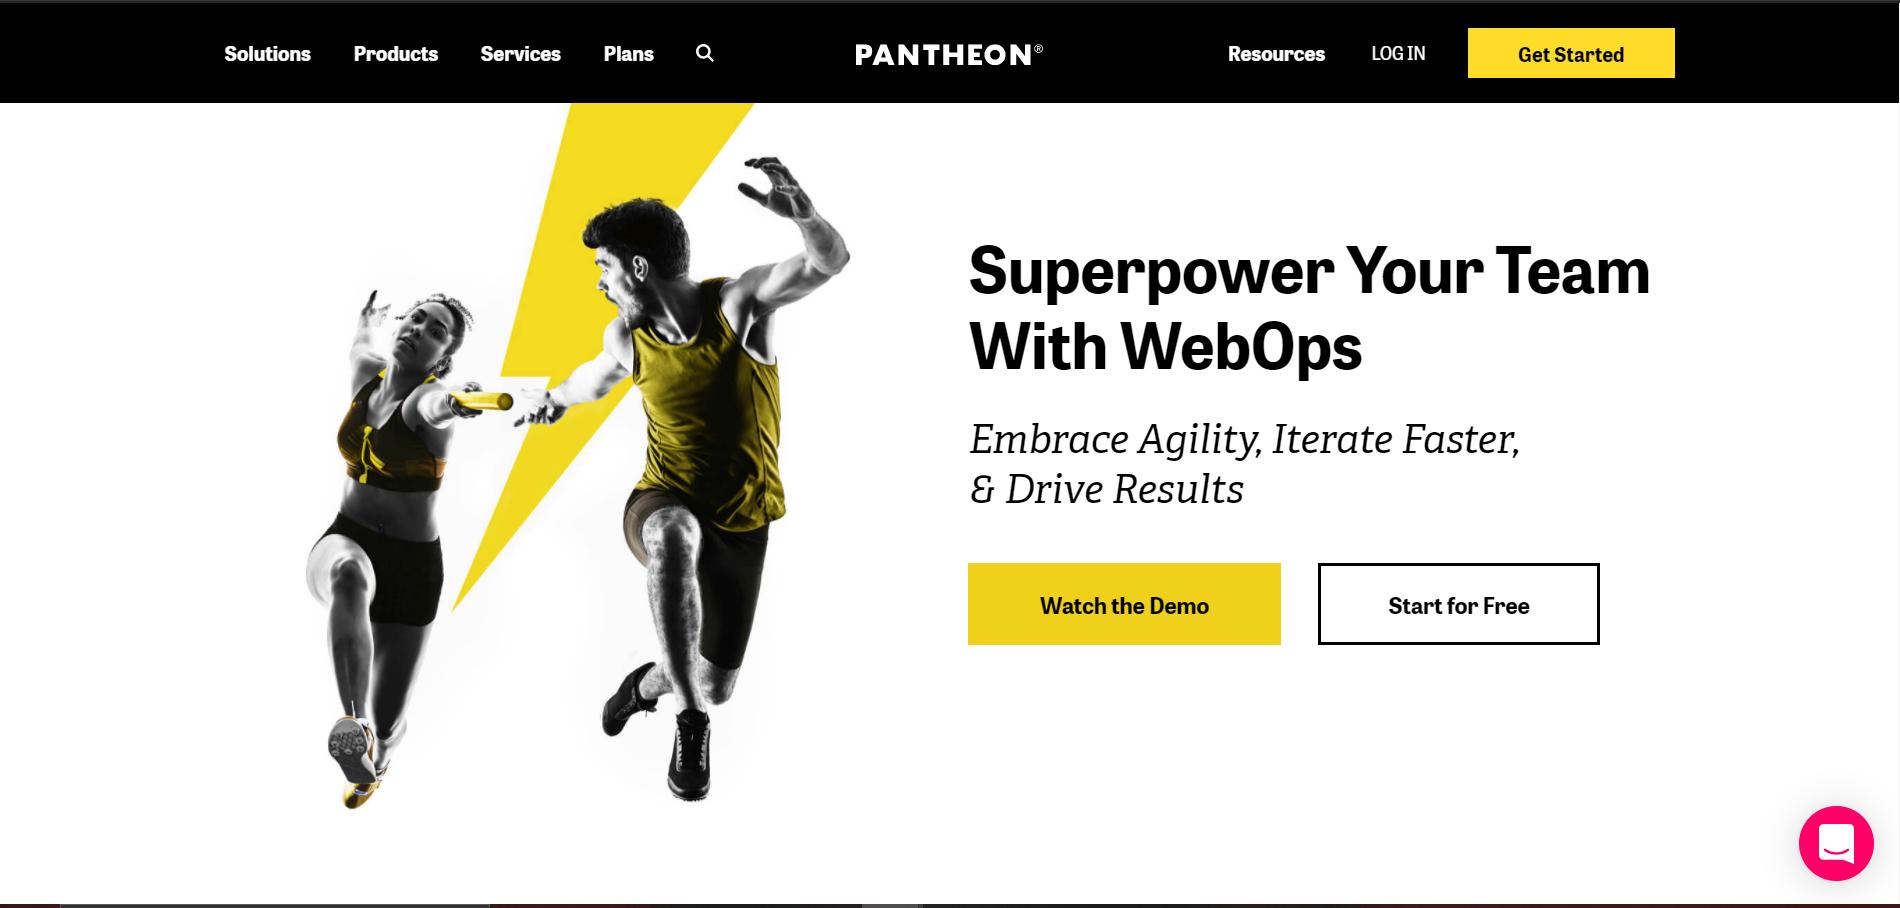 pantheon homepage